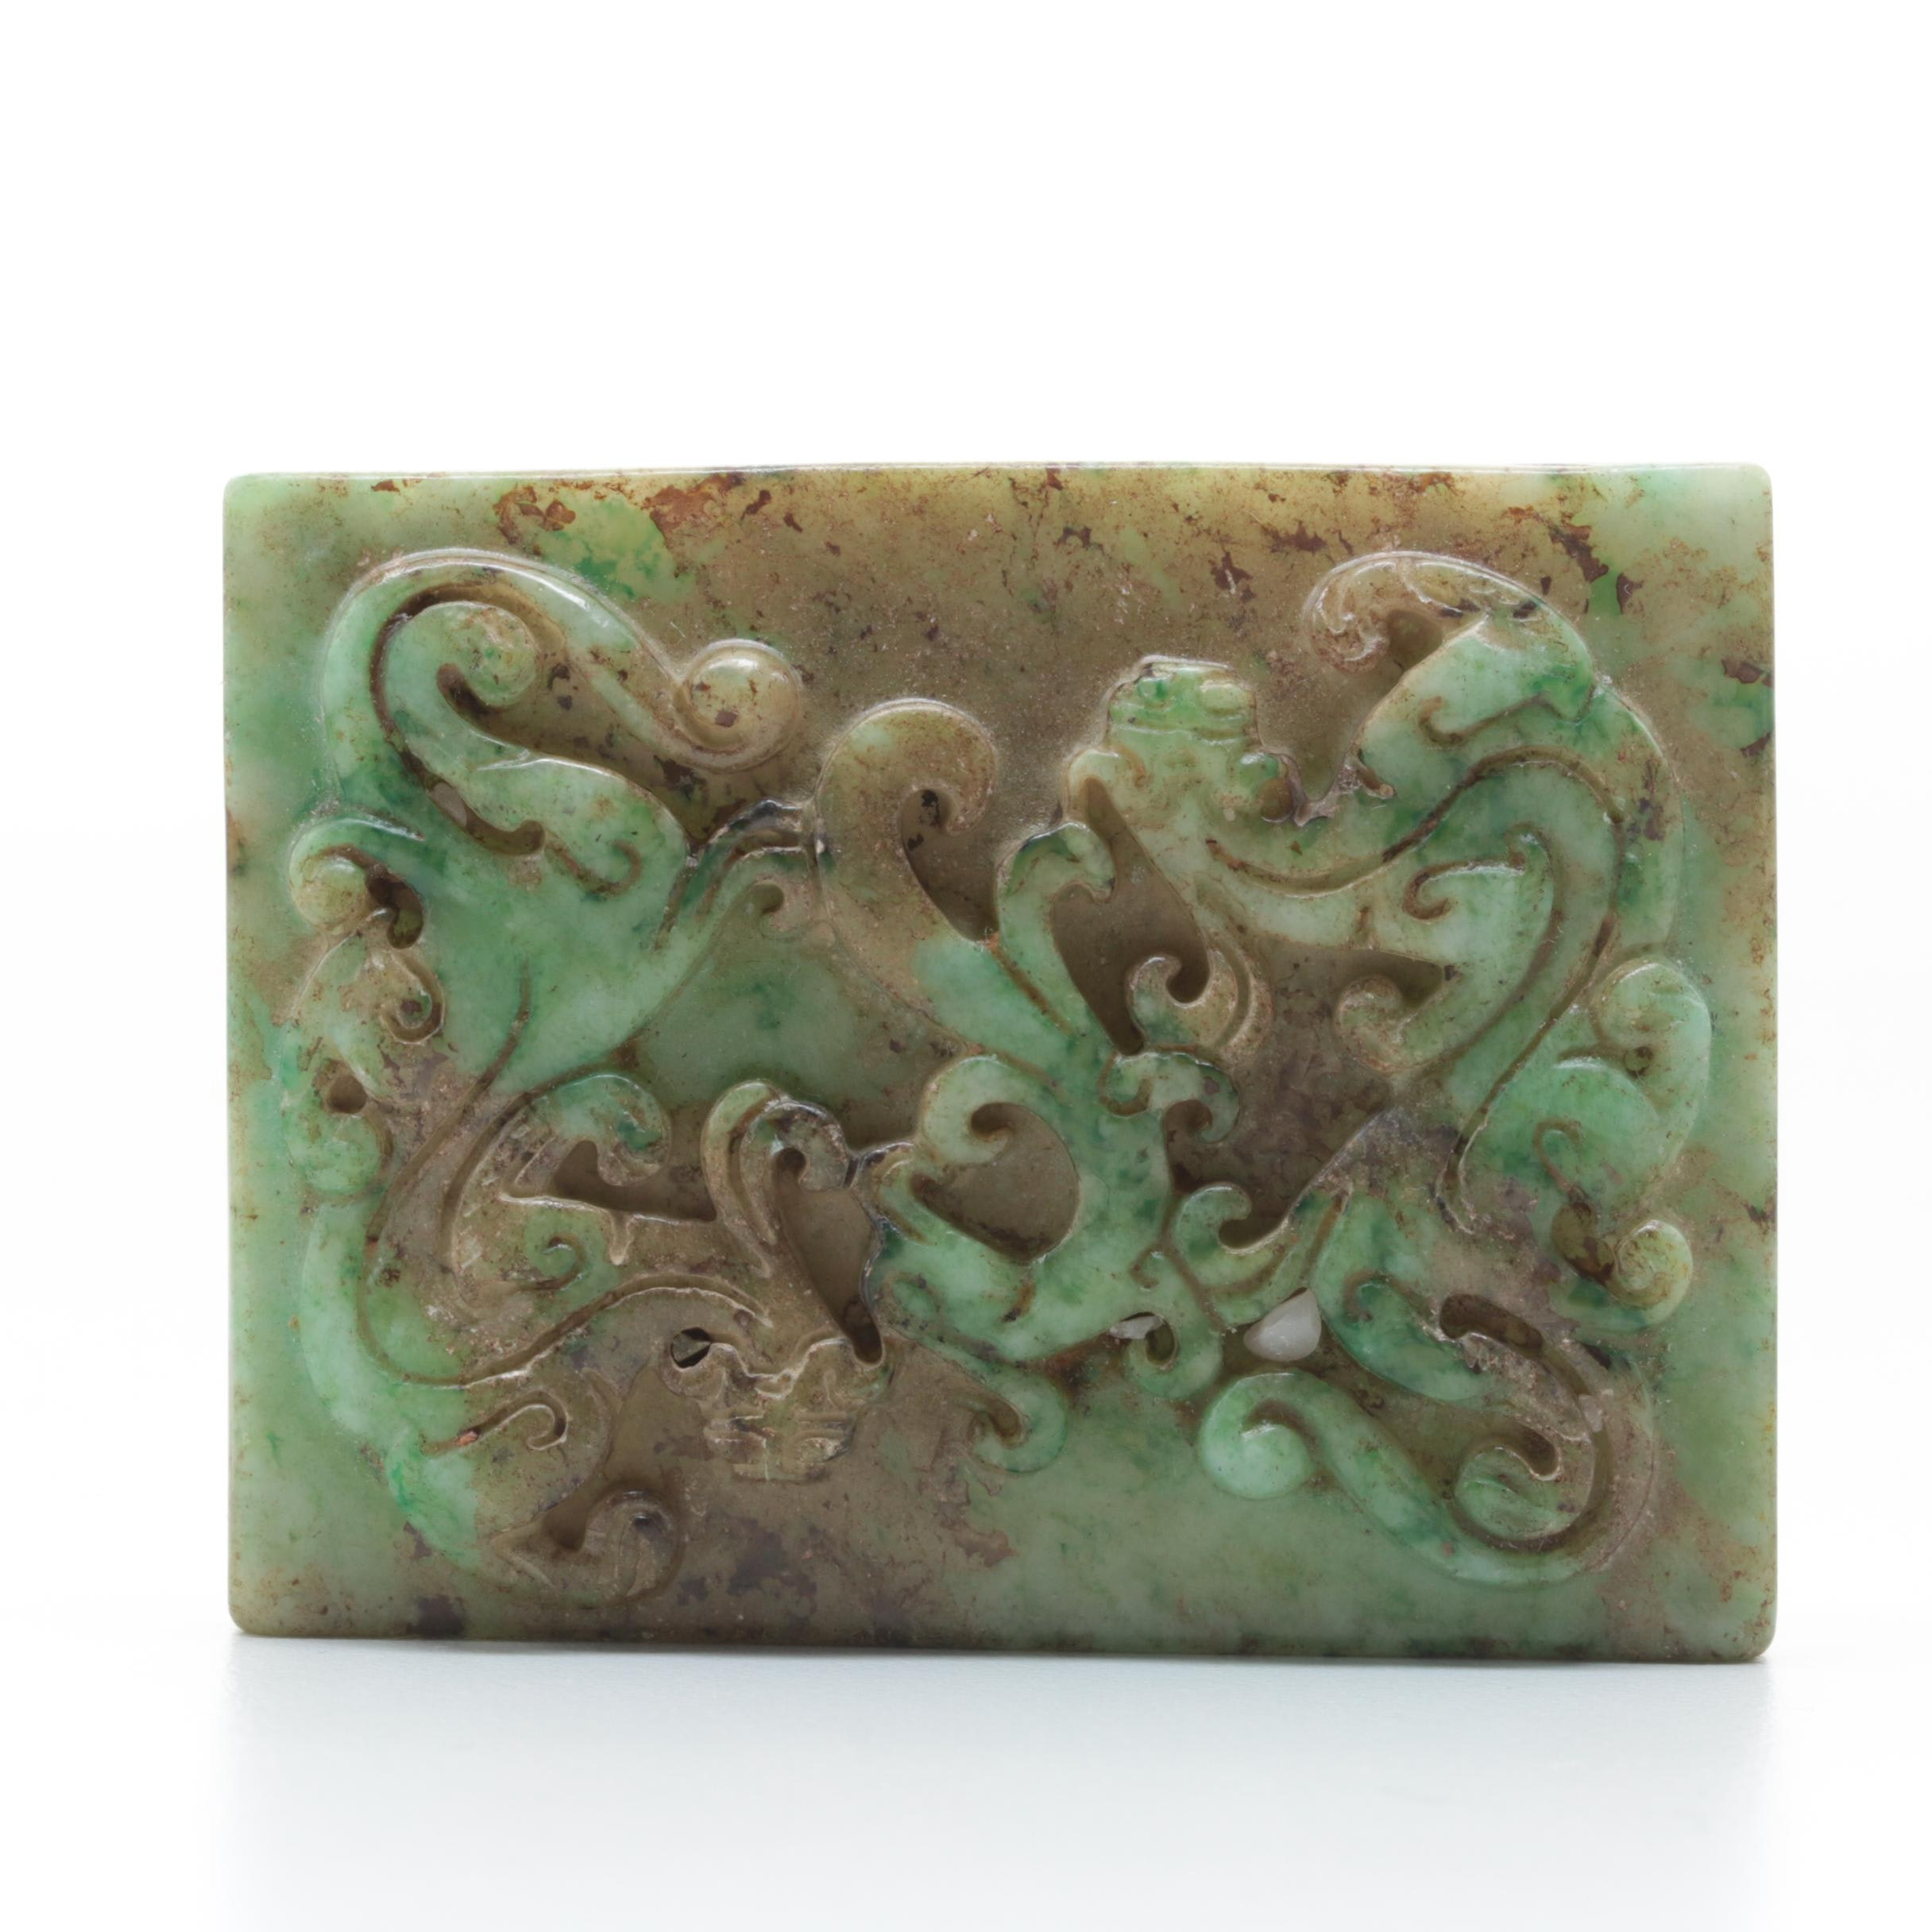 Jadeite Tablet Carving